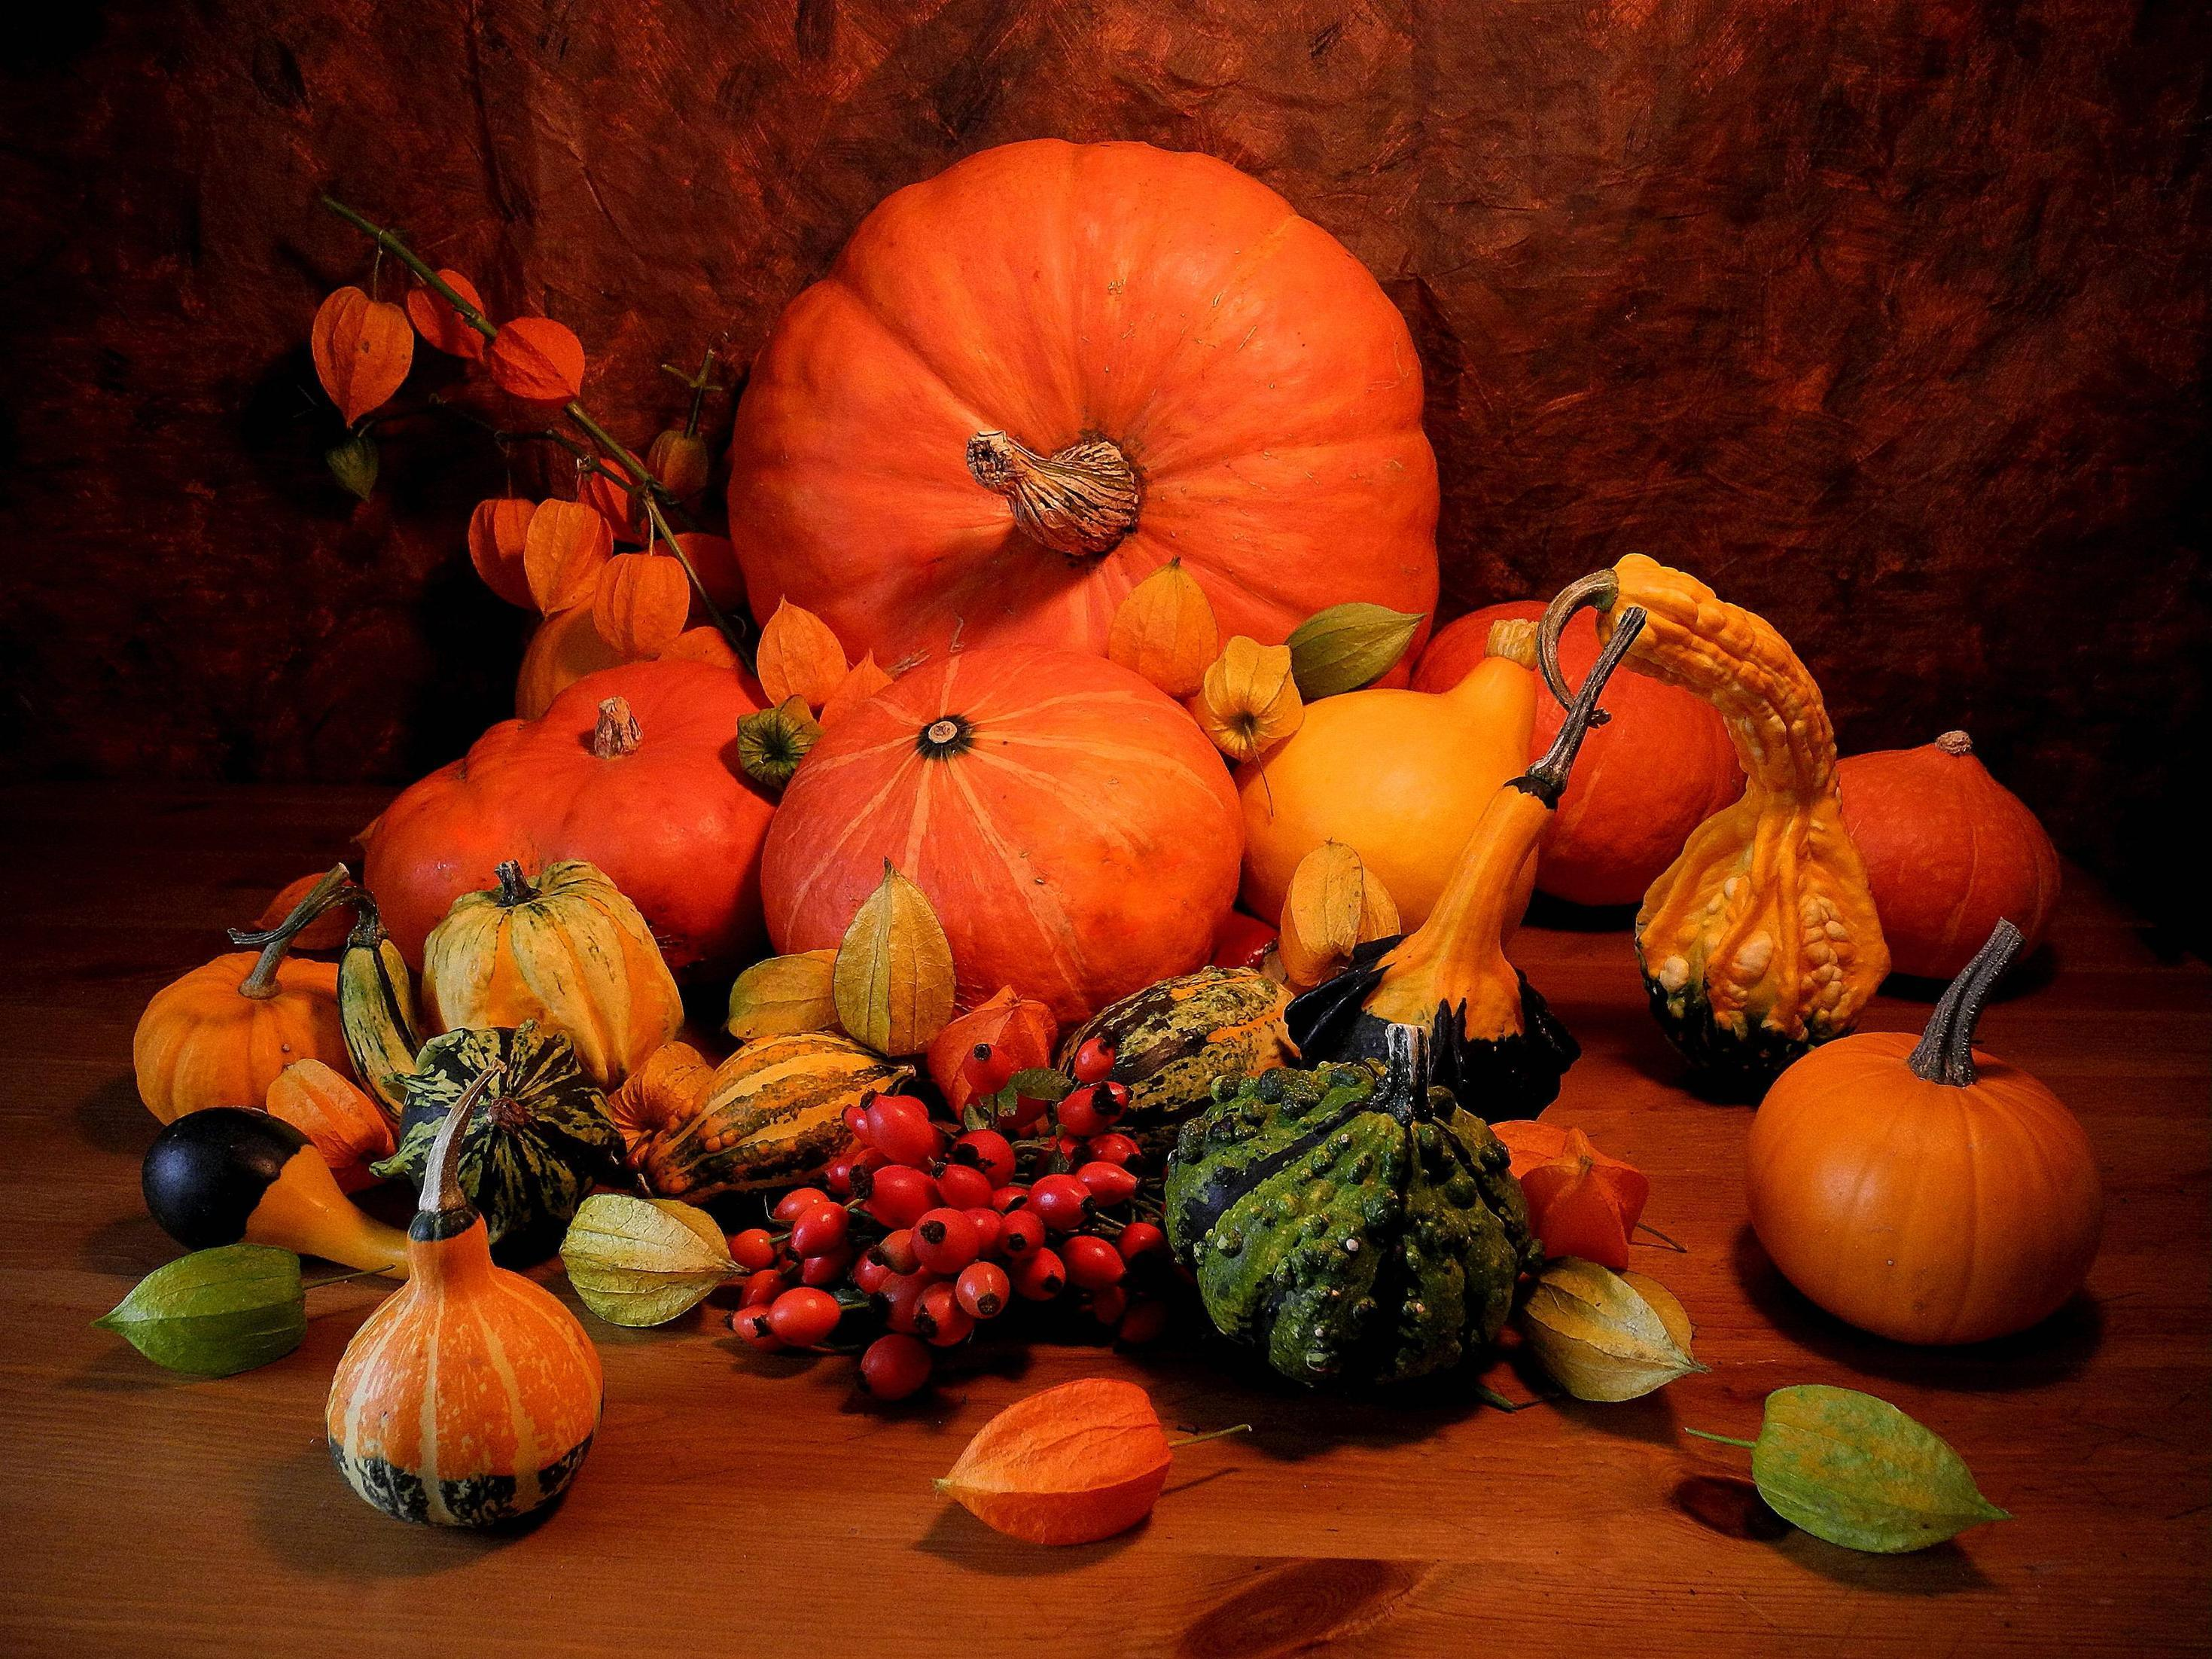 Pumpkin wallpapers free wallpaper cave - Fall wallpaper pumpkins ...